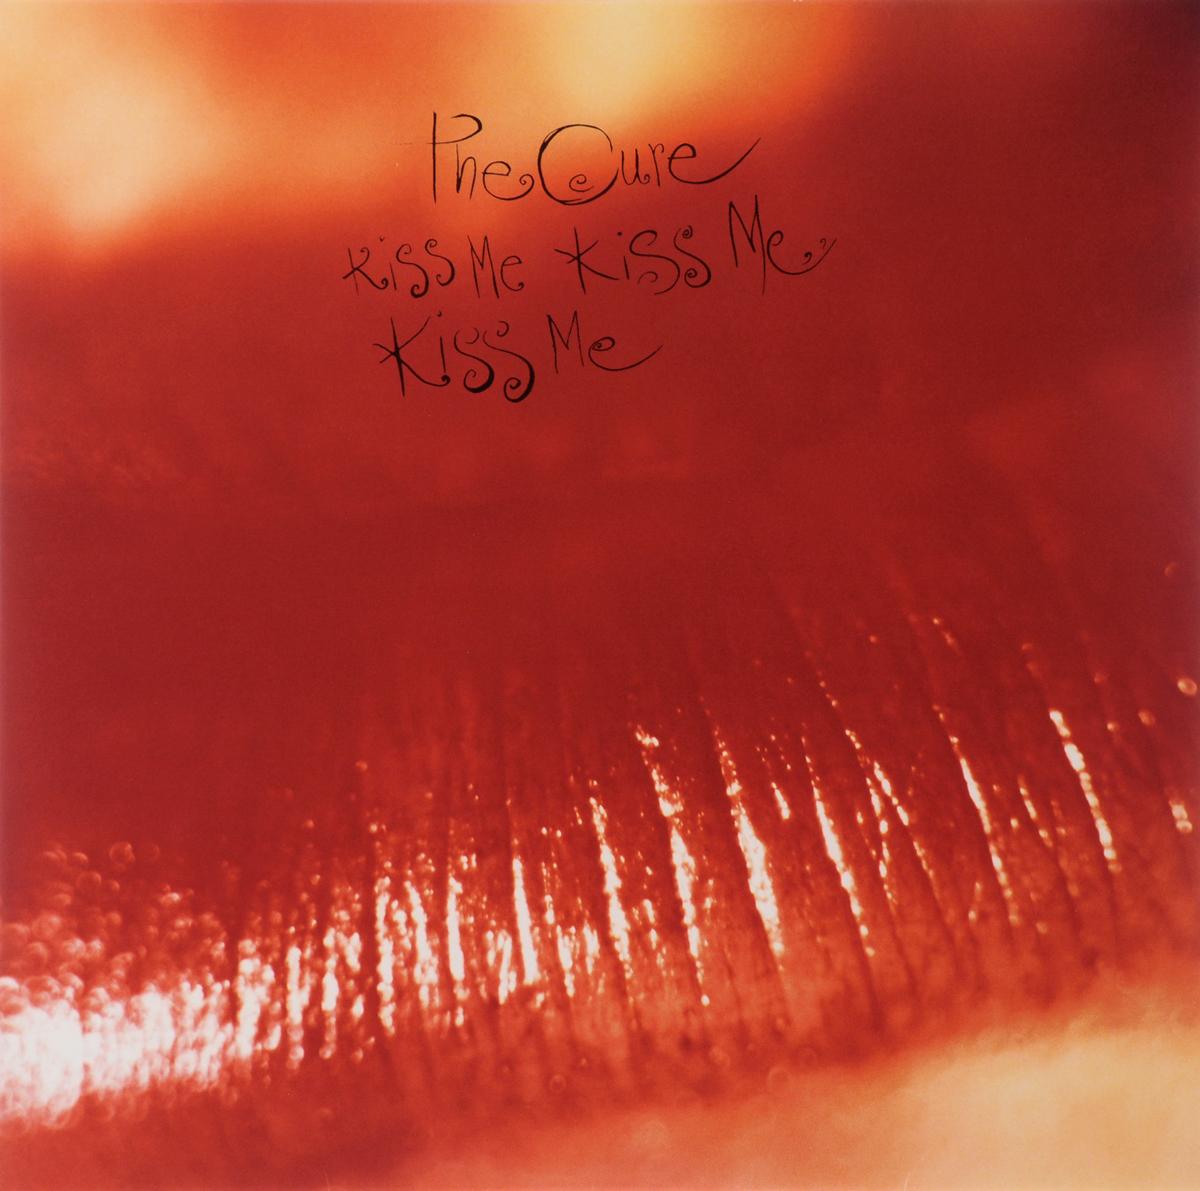 The Cure The Cure. Kiss Me, Kiss Me, Kiss Me (2 LP) the cure the cure kiss me kiss me kiss me 2 lp